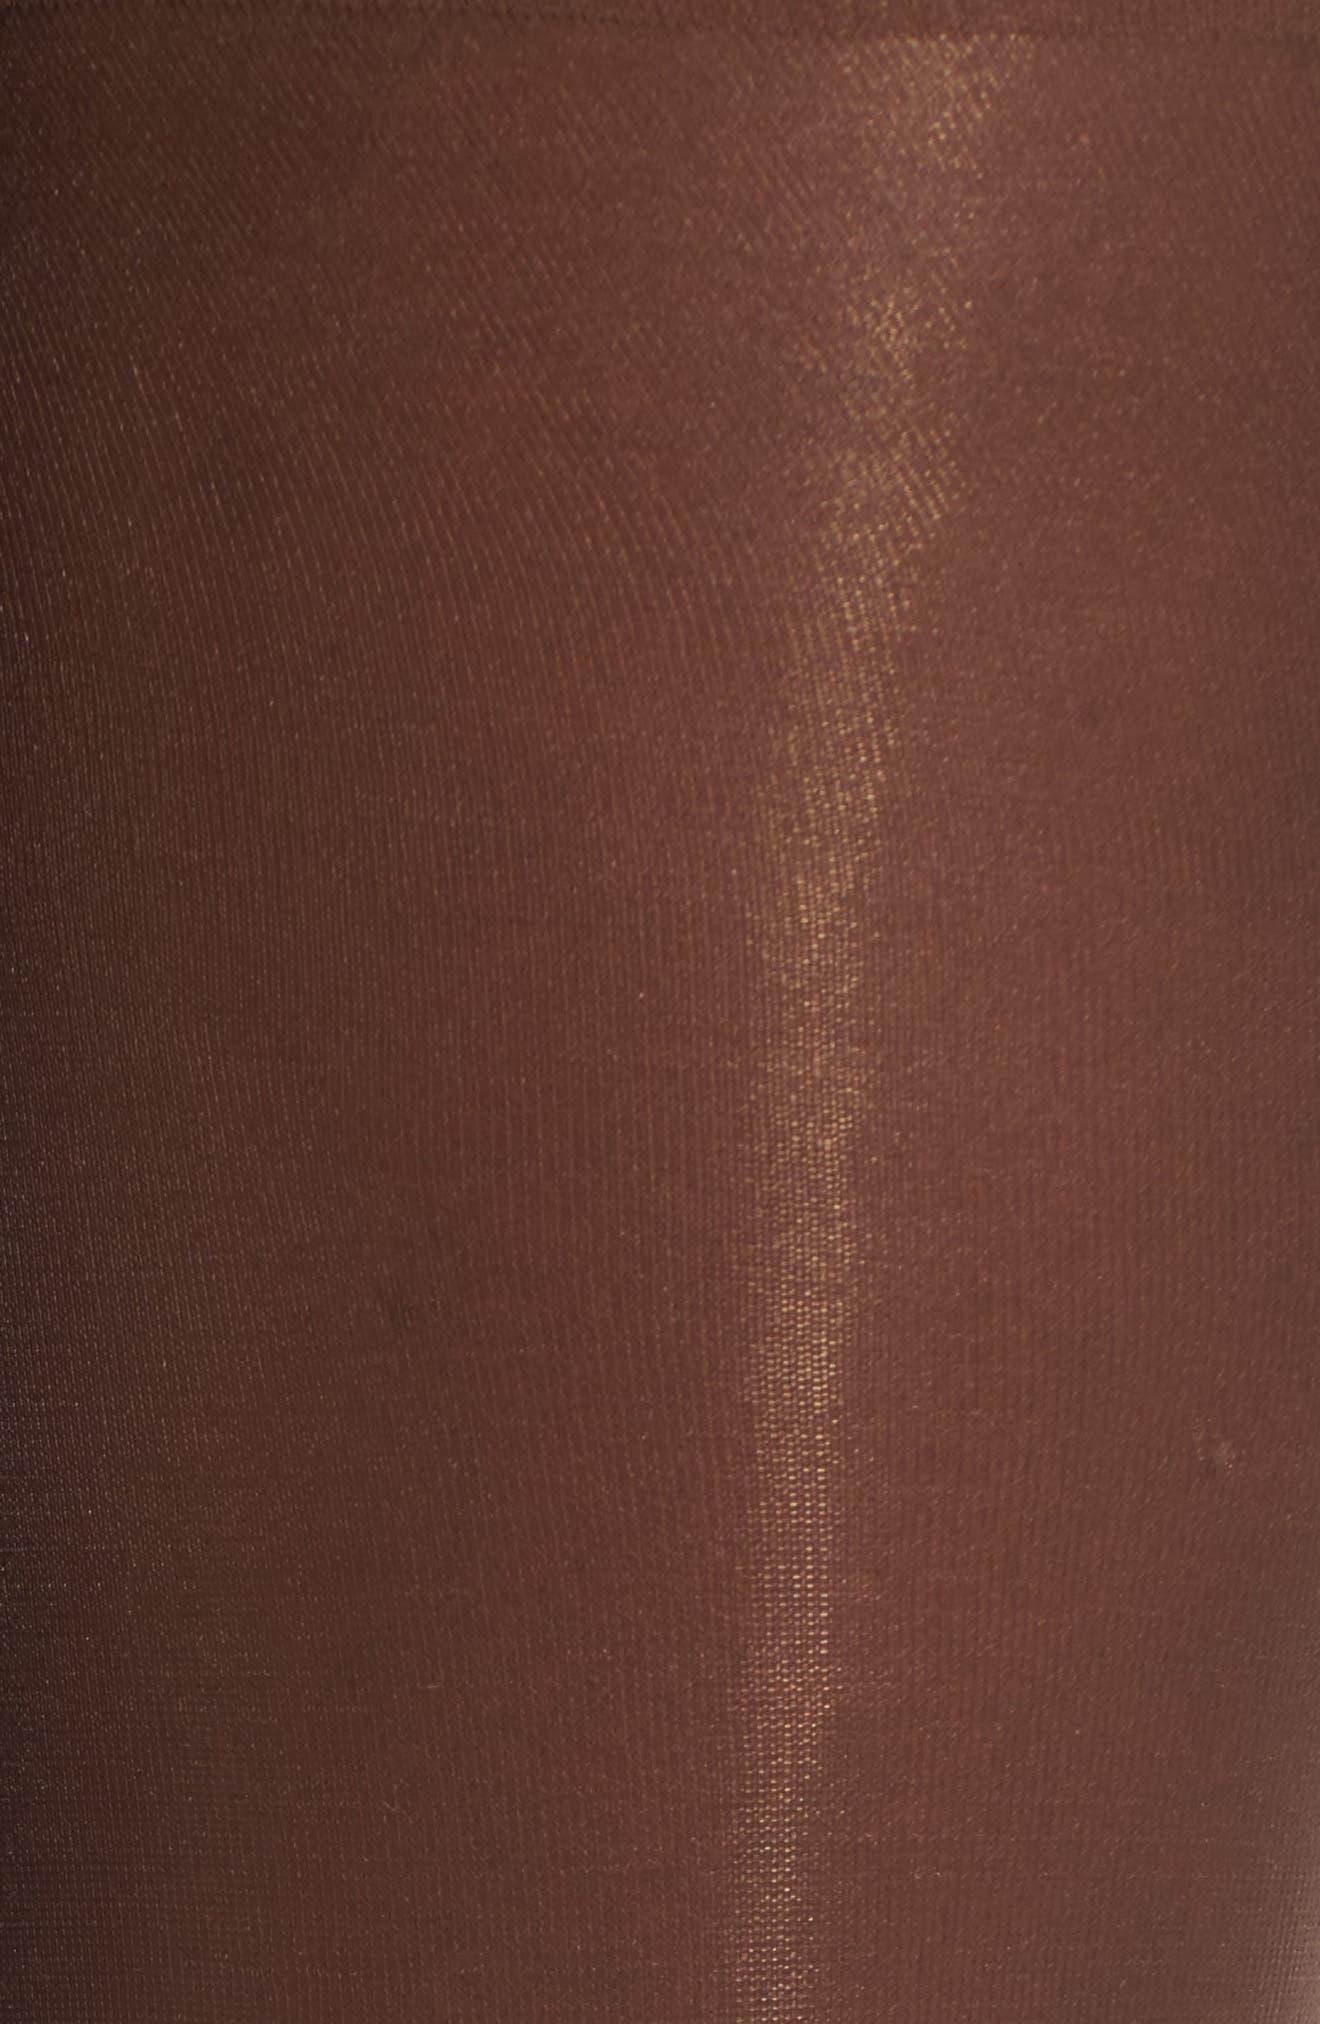 NUBIAN SKIN,                             Glossy Sheer Pantyhose,                             Alternate thumbnail 2, color,                             200